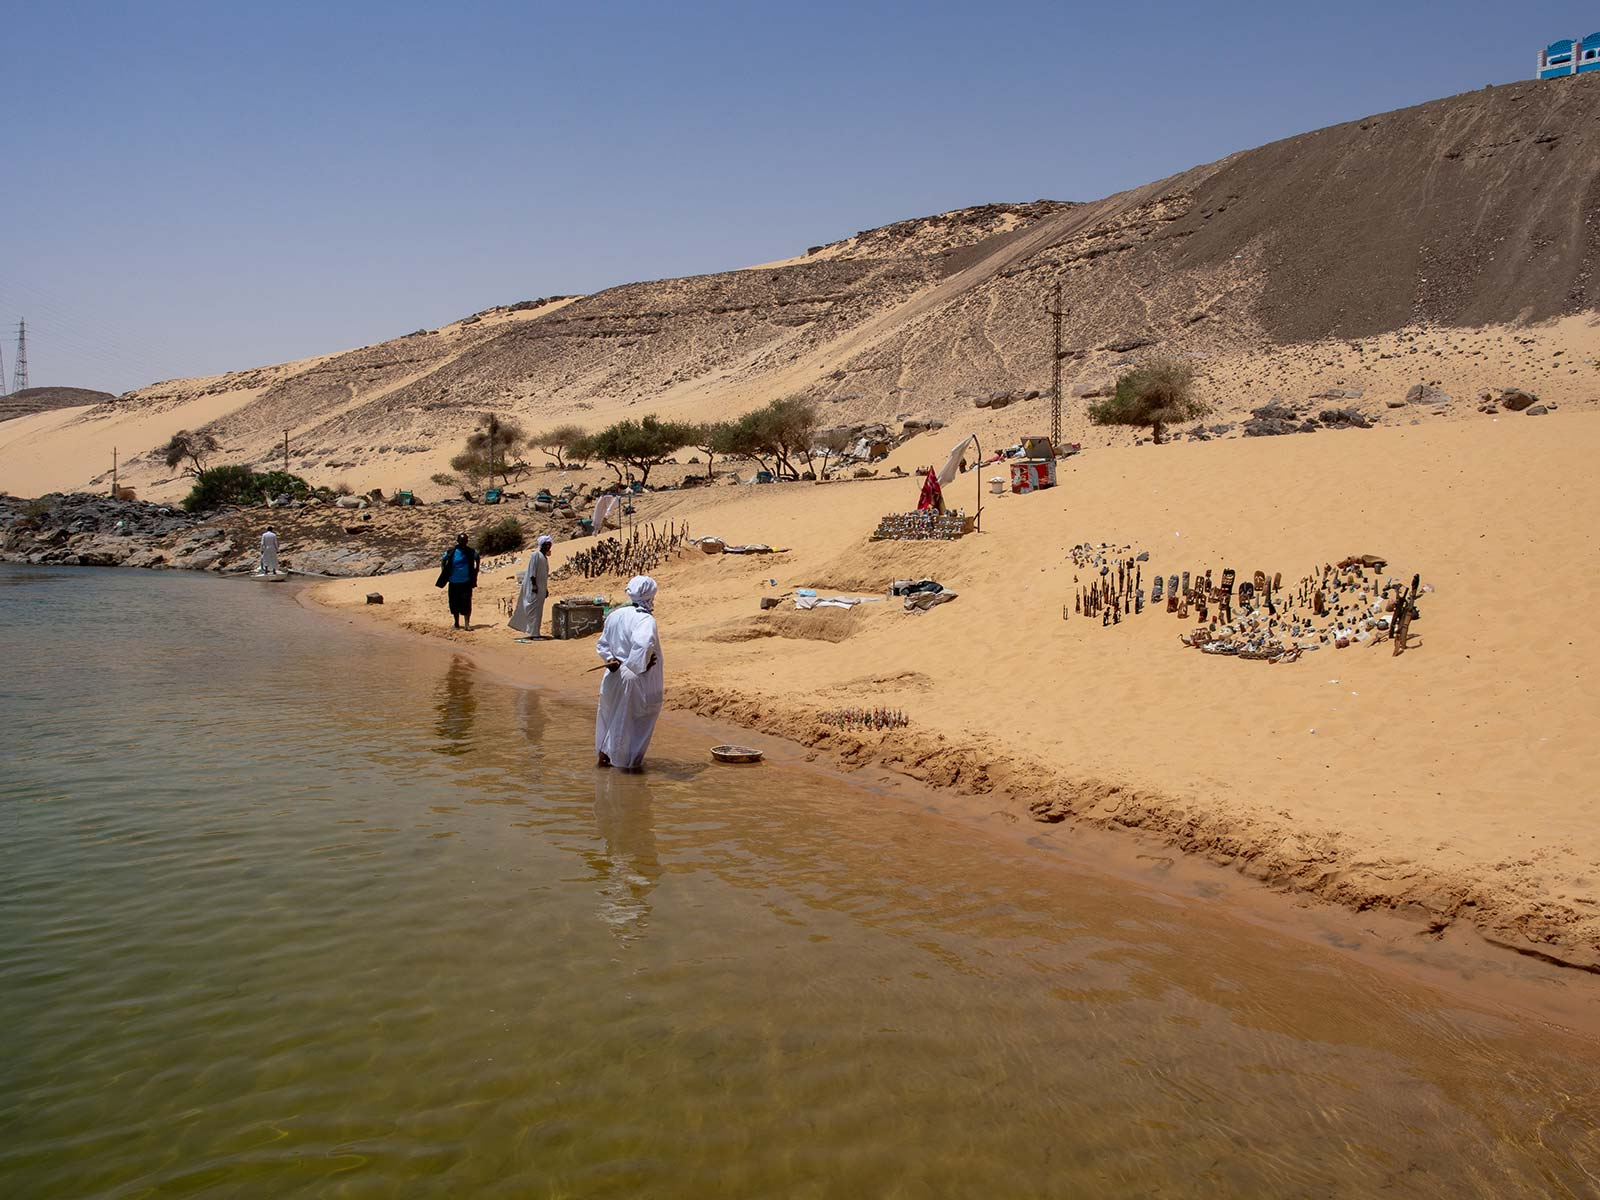 Baden am Nil in Assuan